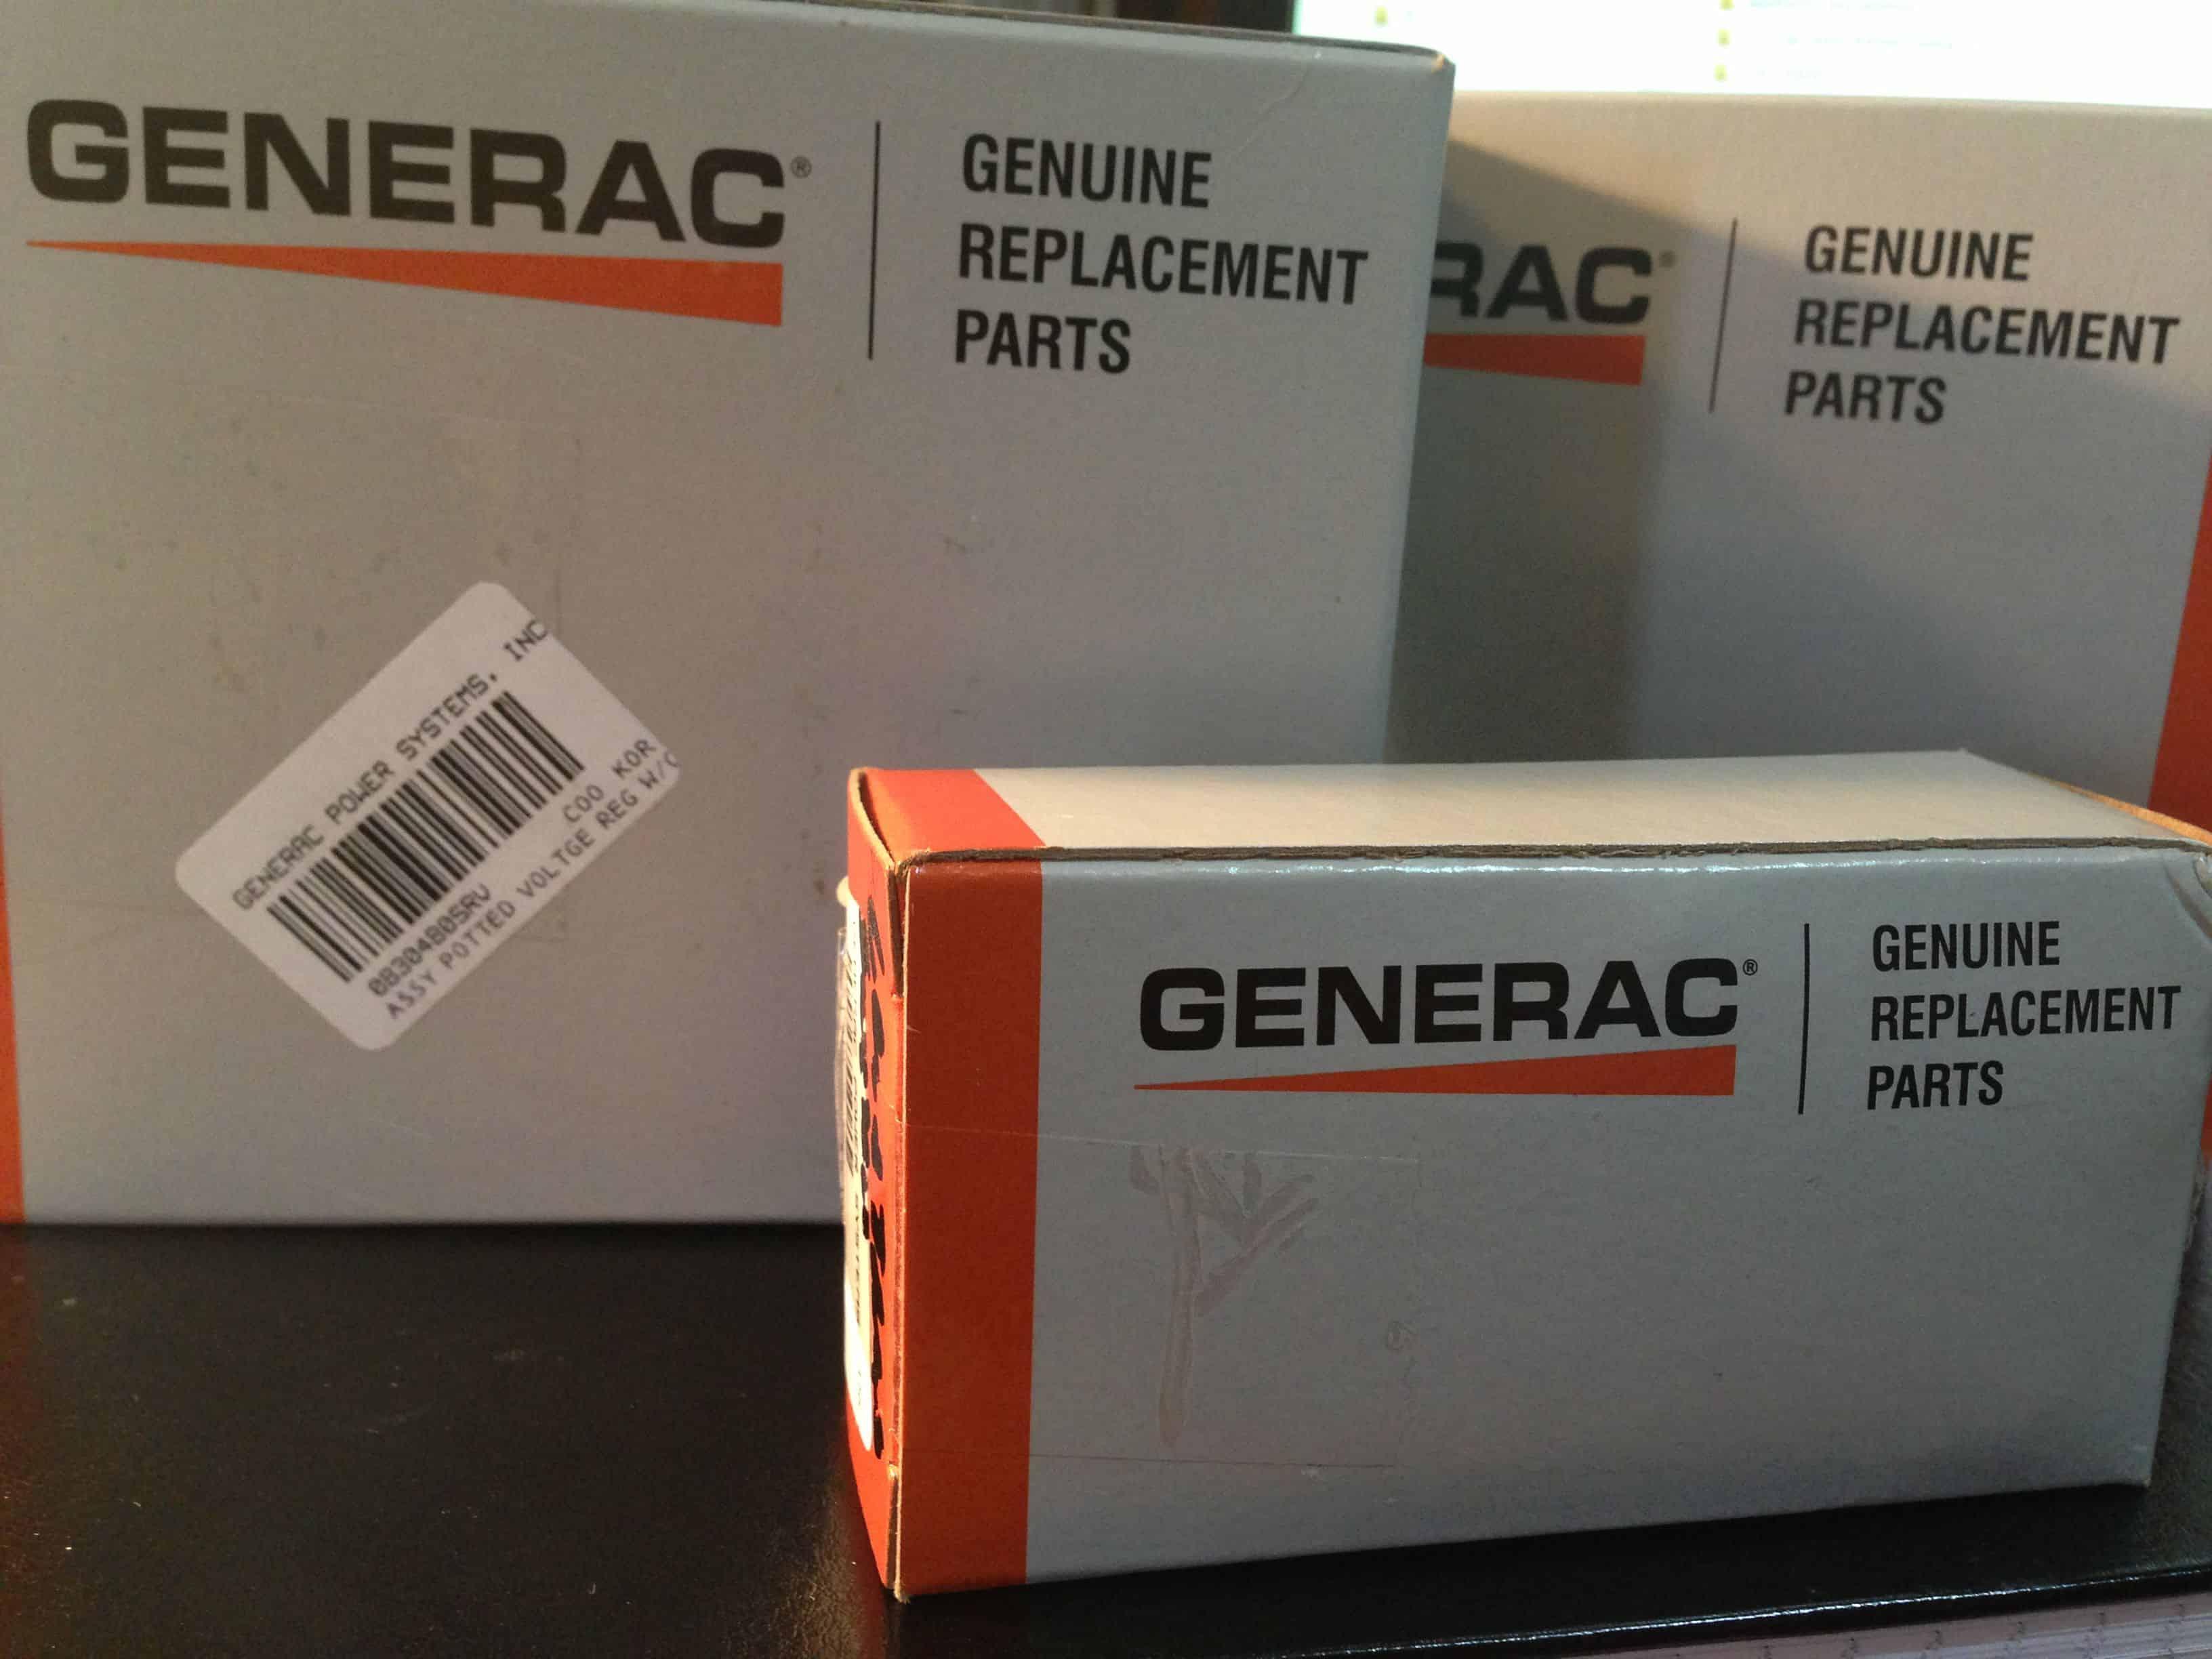 Genuine Generac Replacement Parts